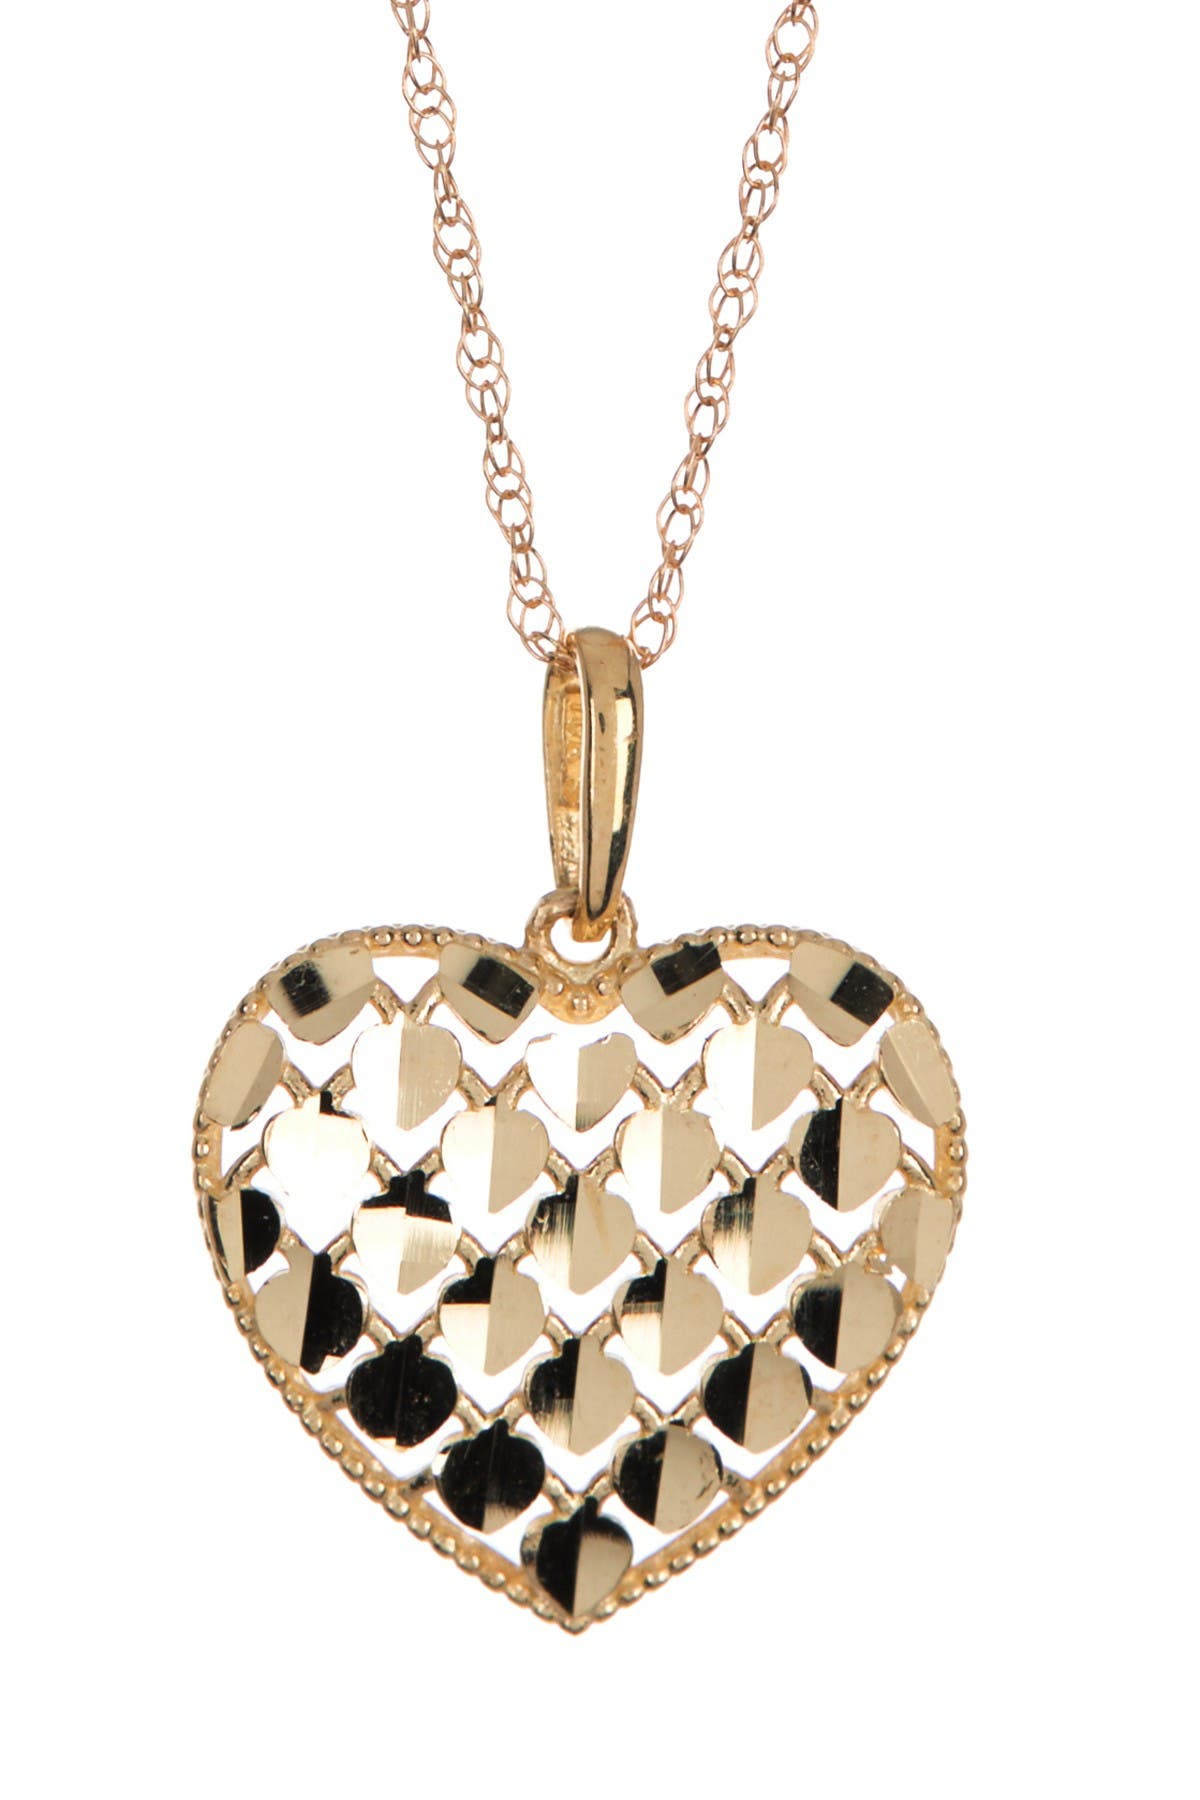 Image of Candela 10K Gold Sequin Heart Pendant Necklace